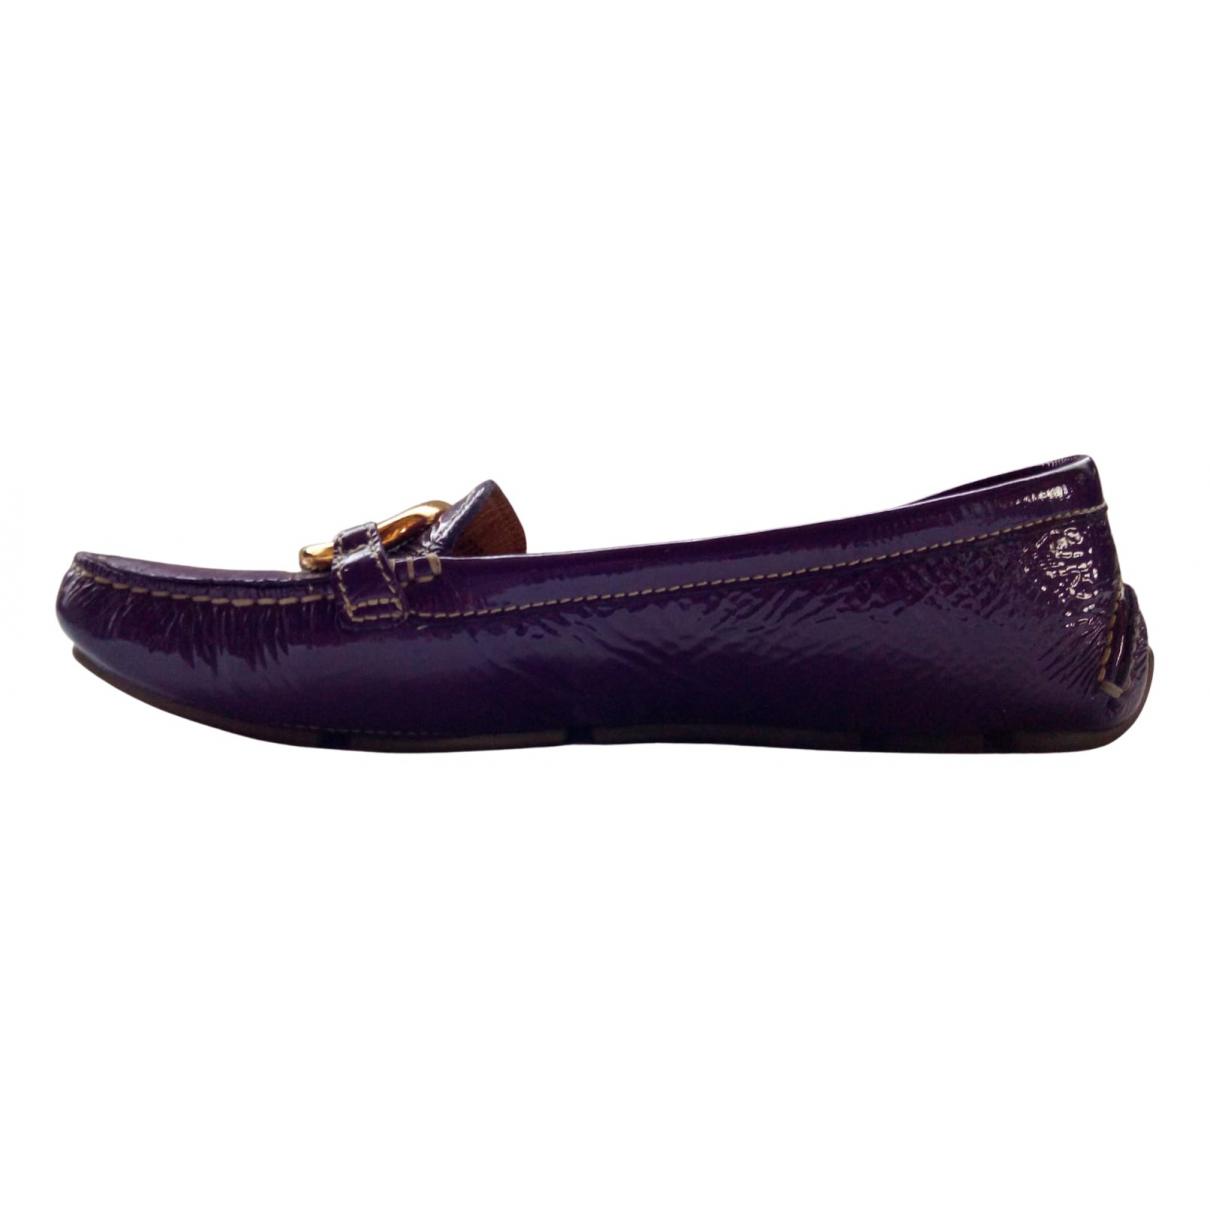 Prada \N Purple Patent leather Flats for Women 38 EU